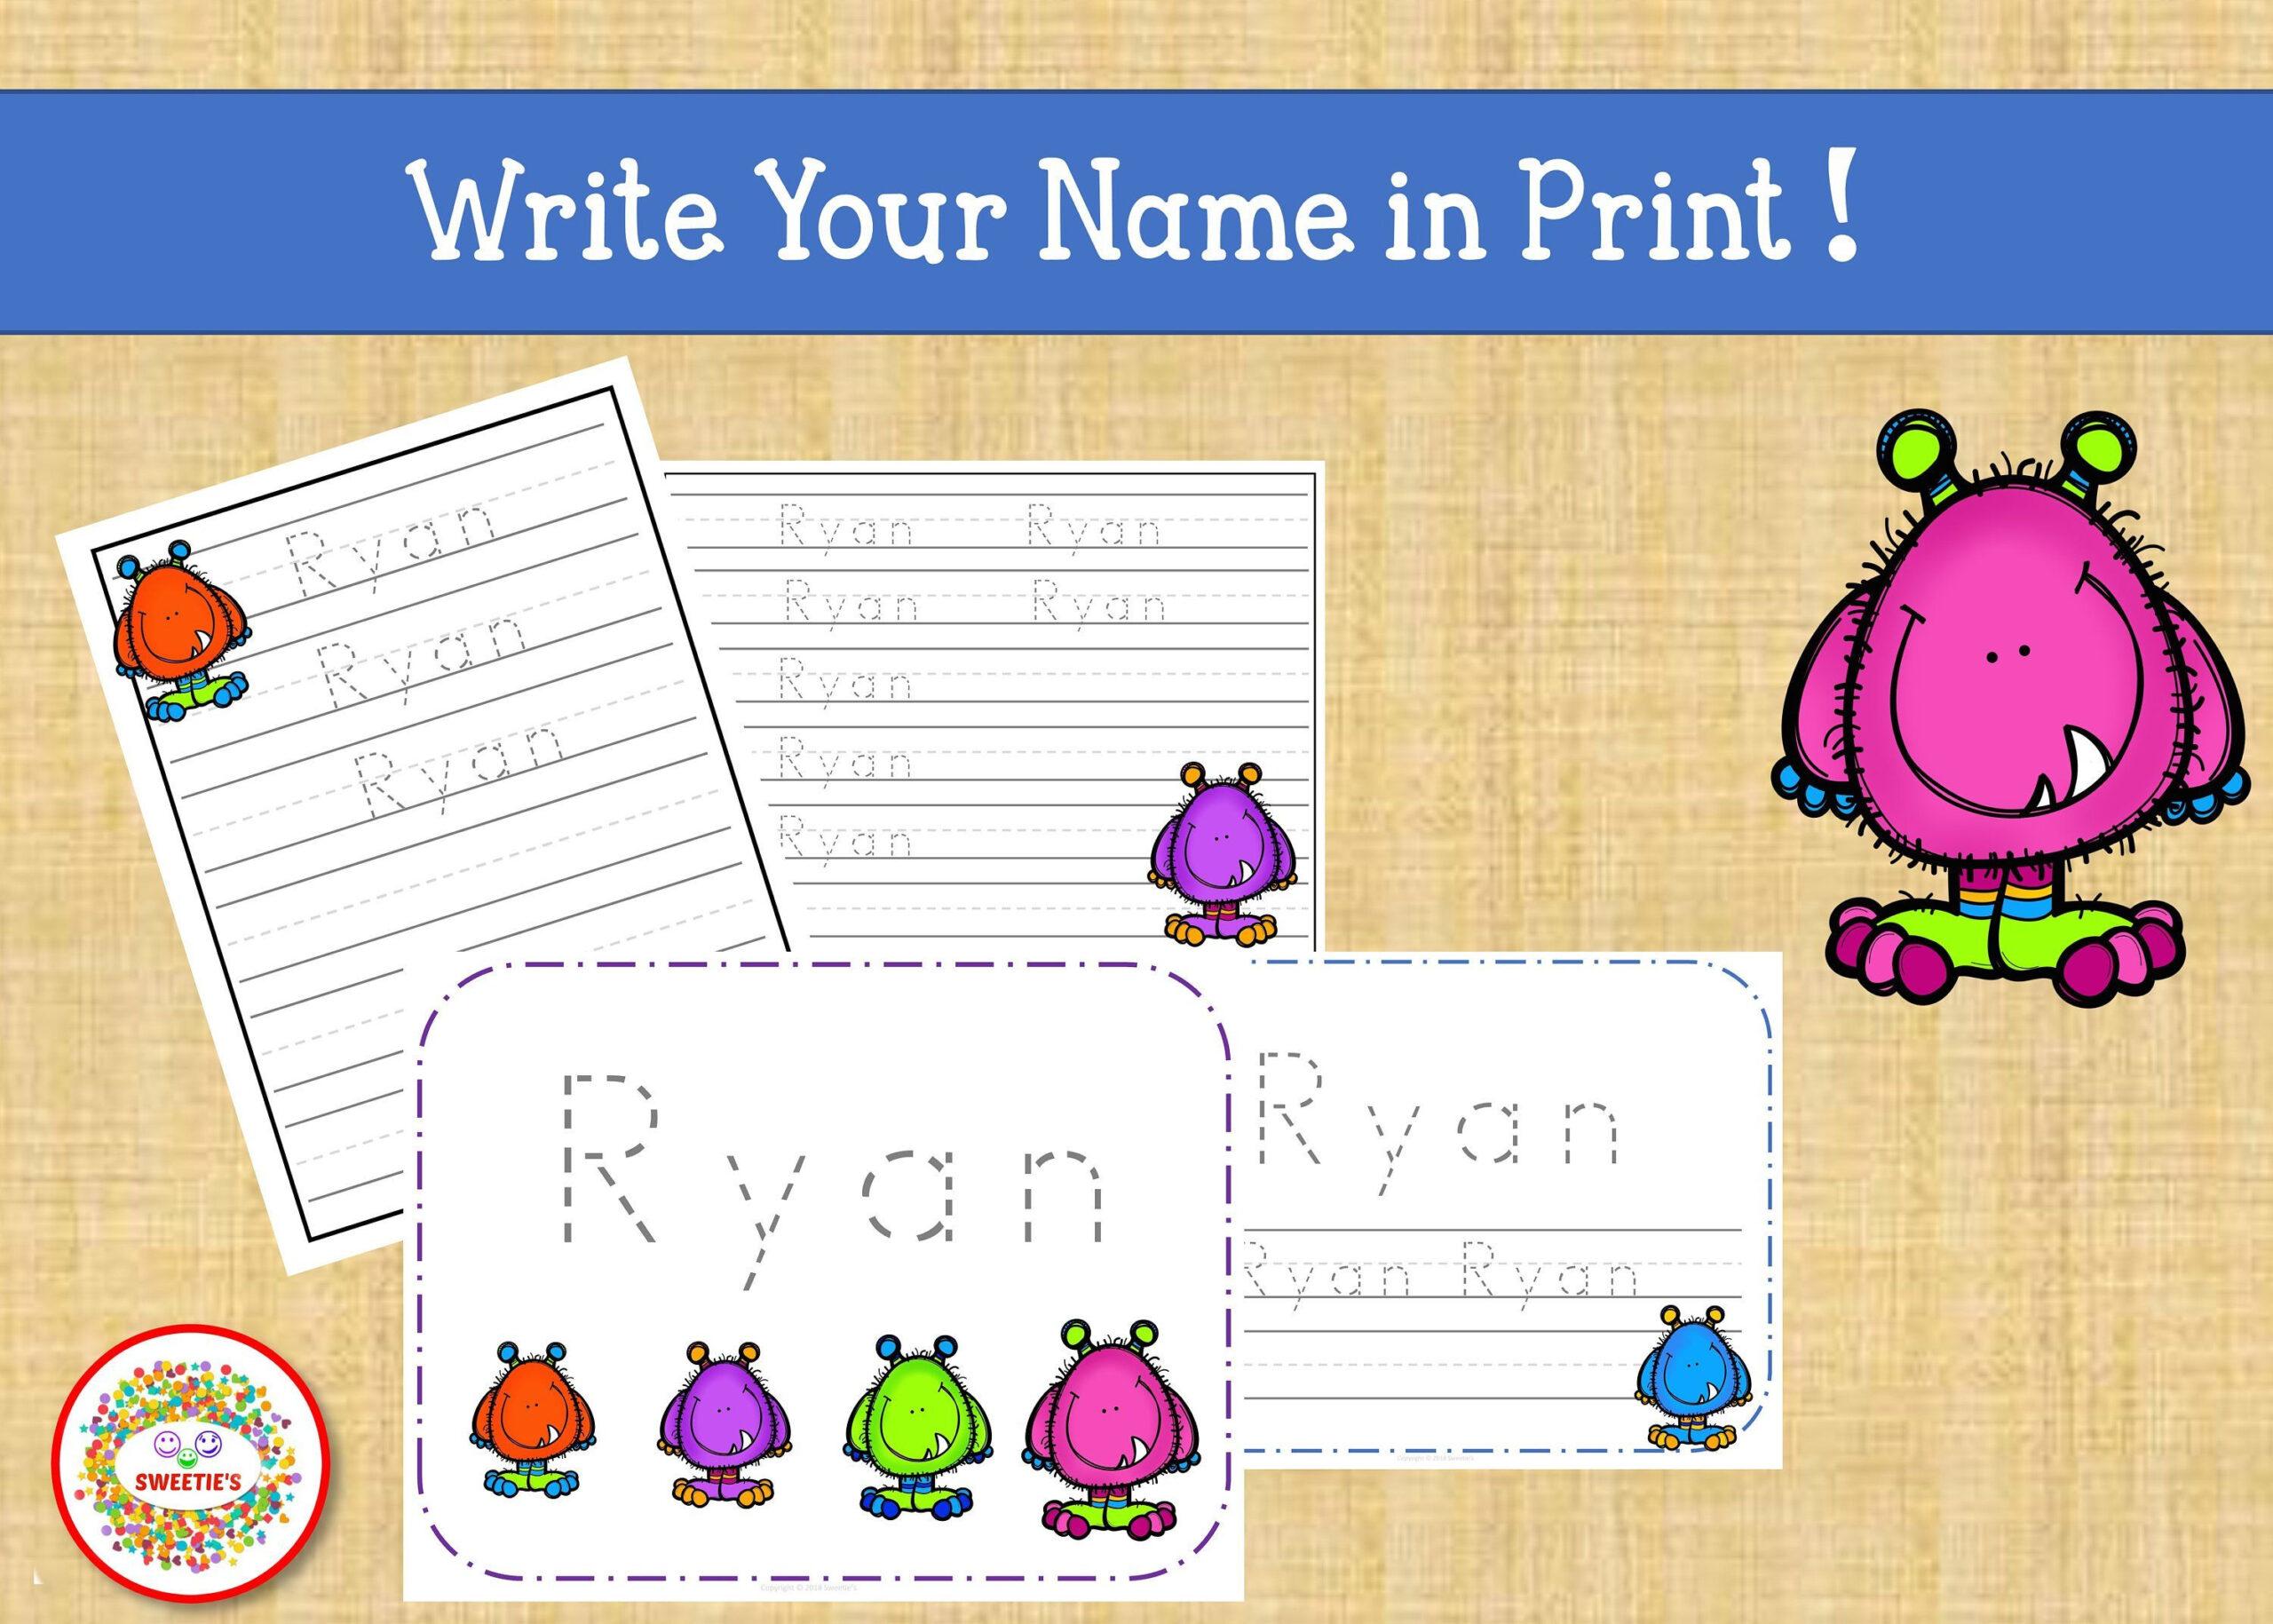 Name Tracing Handwriting Worksheet Personalized Name | Etsy pertaining to Tracing Name Ryan